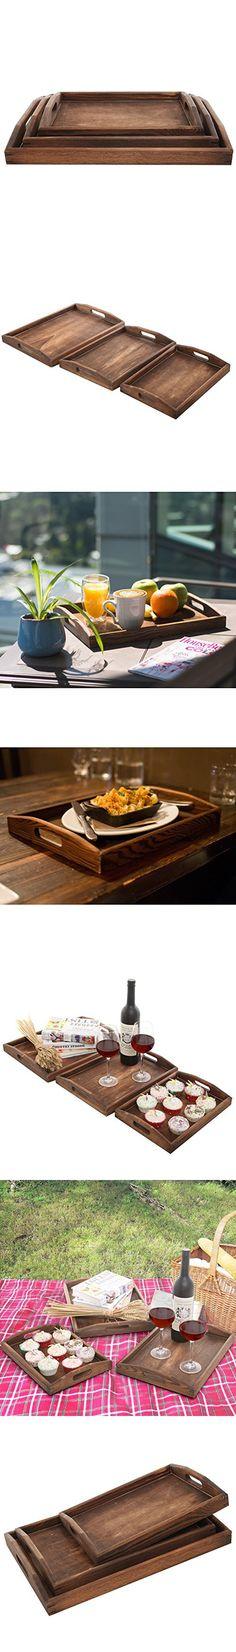 Set of 3 Dark Brown Double Handle Rectangular Nesting Breakfast / Coffee Table / Butler Serving Trays